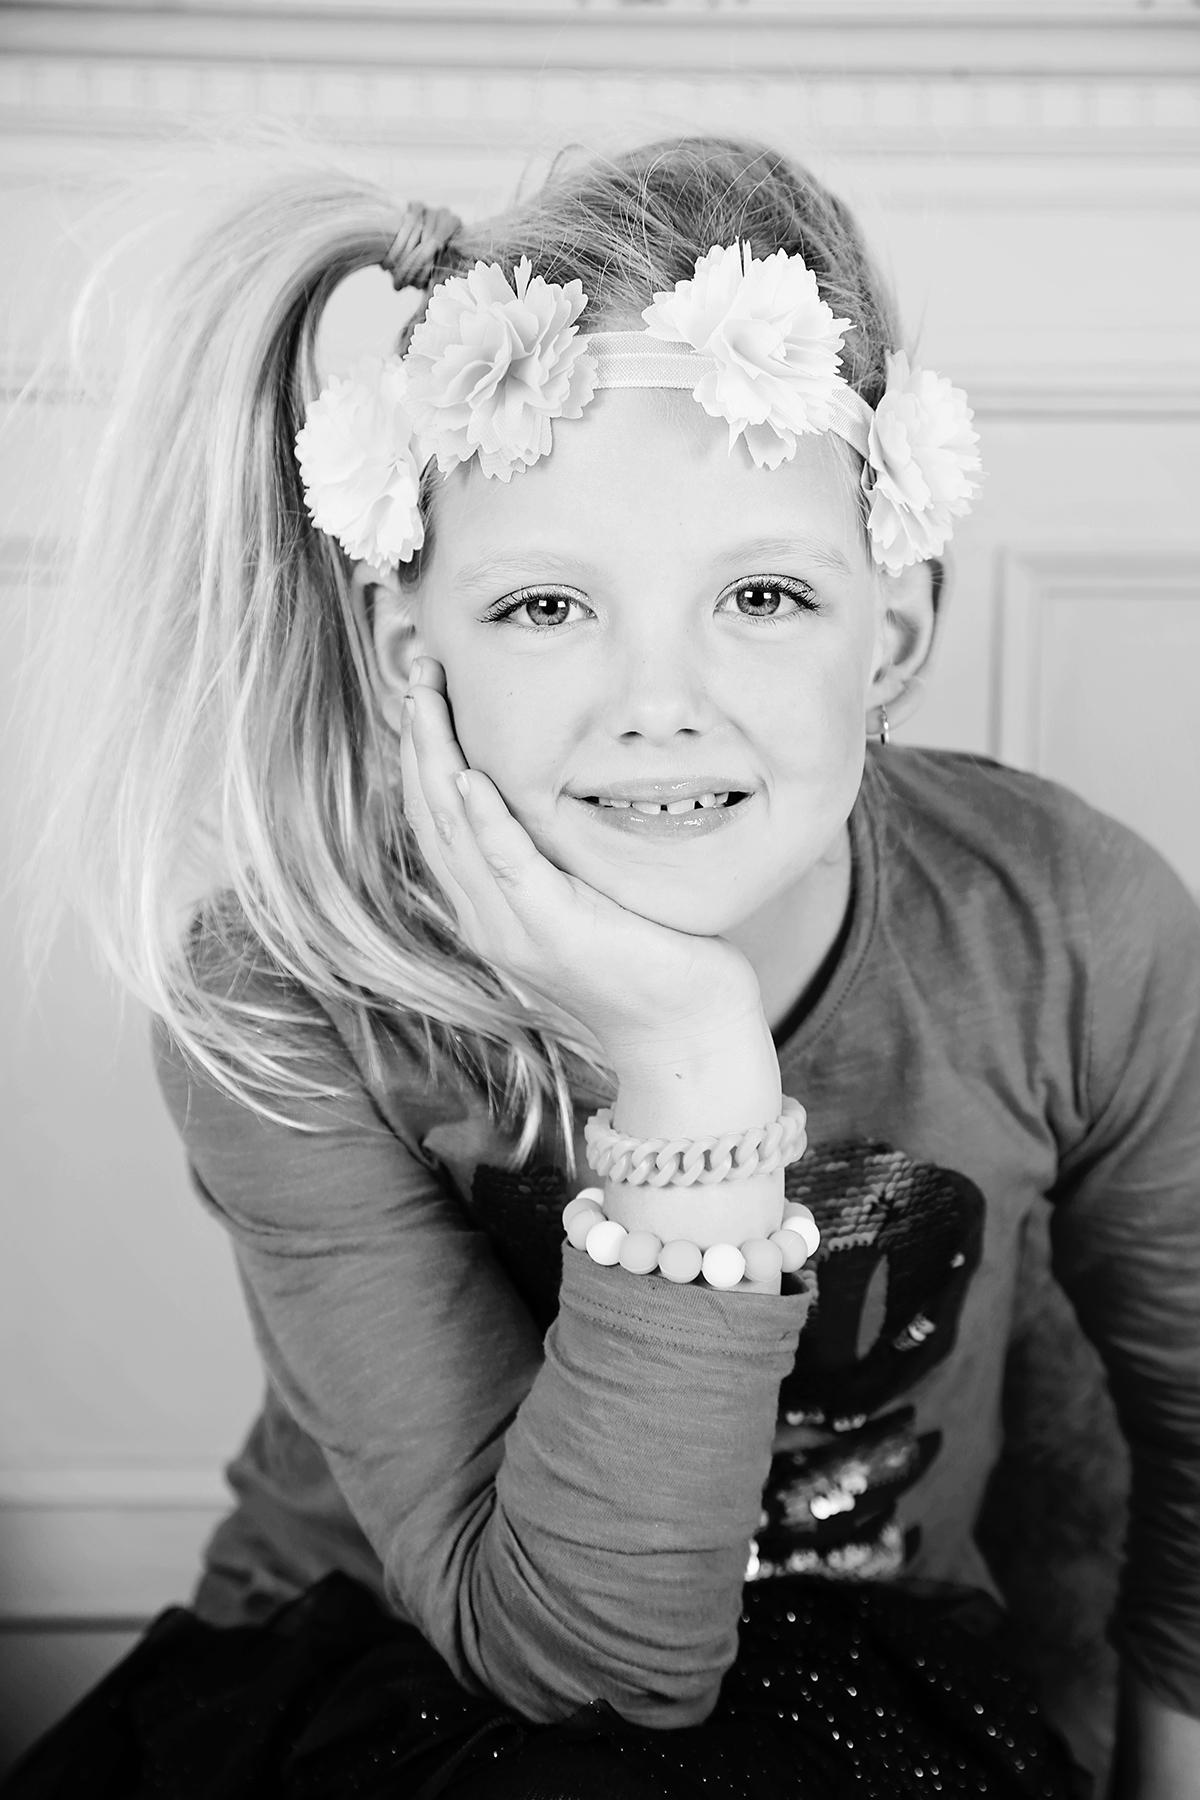 Kinderfeestje - Suus' FotoSjop